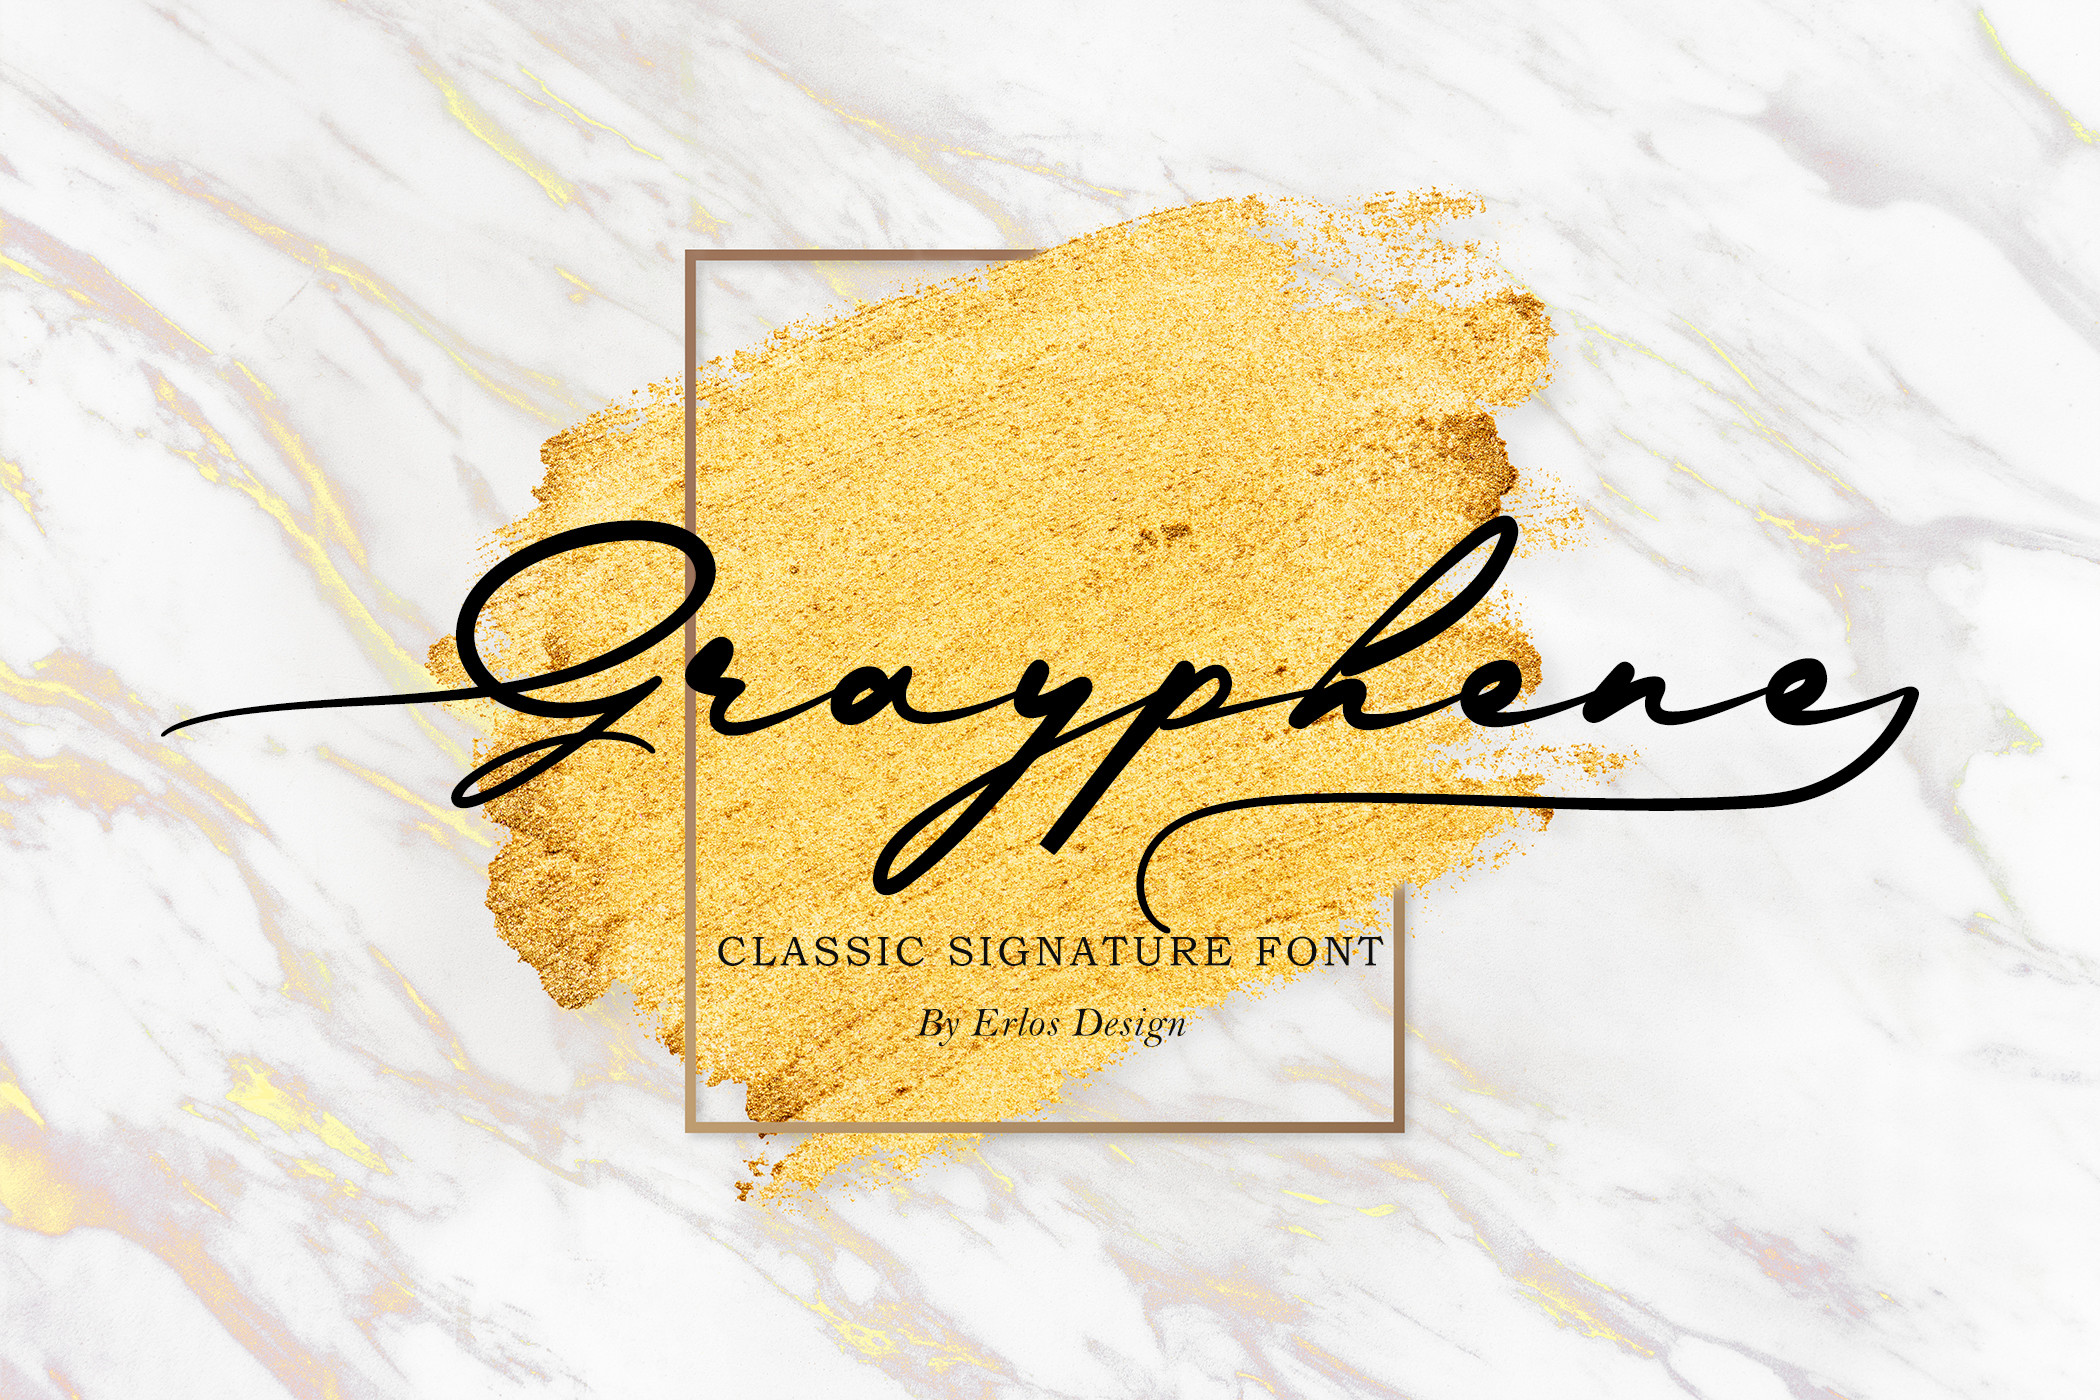 Grayphene Classic Calligraphy Typeface -1